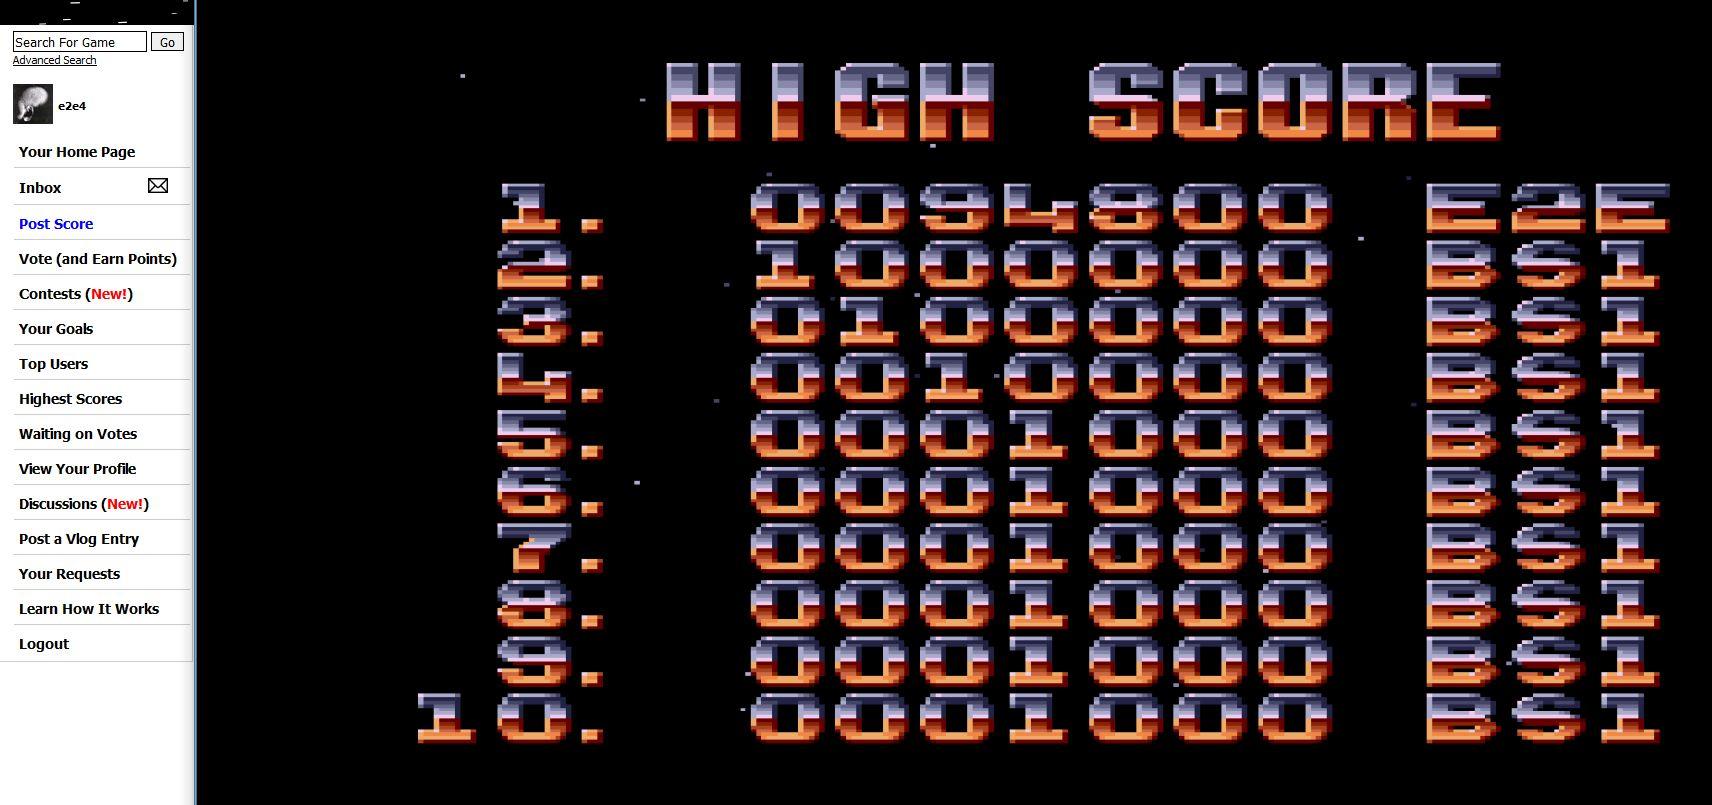 e2e4: Xenon 2: Megablast (Amiga Emulated) 94,800 points on 2017-10-22 08:04:28